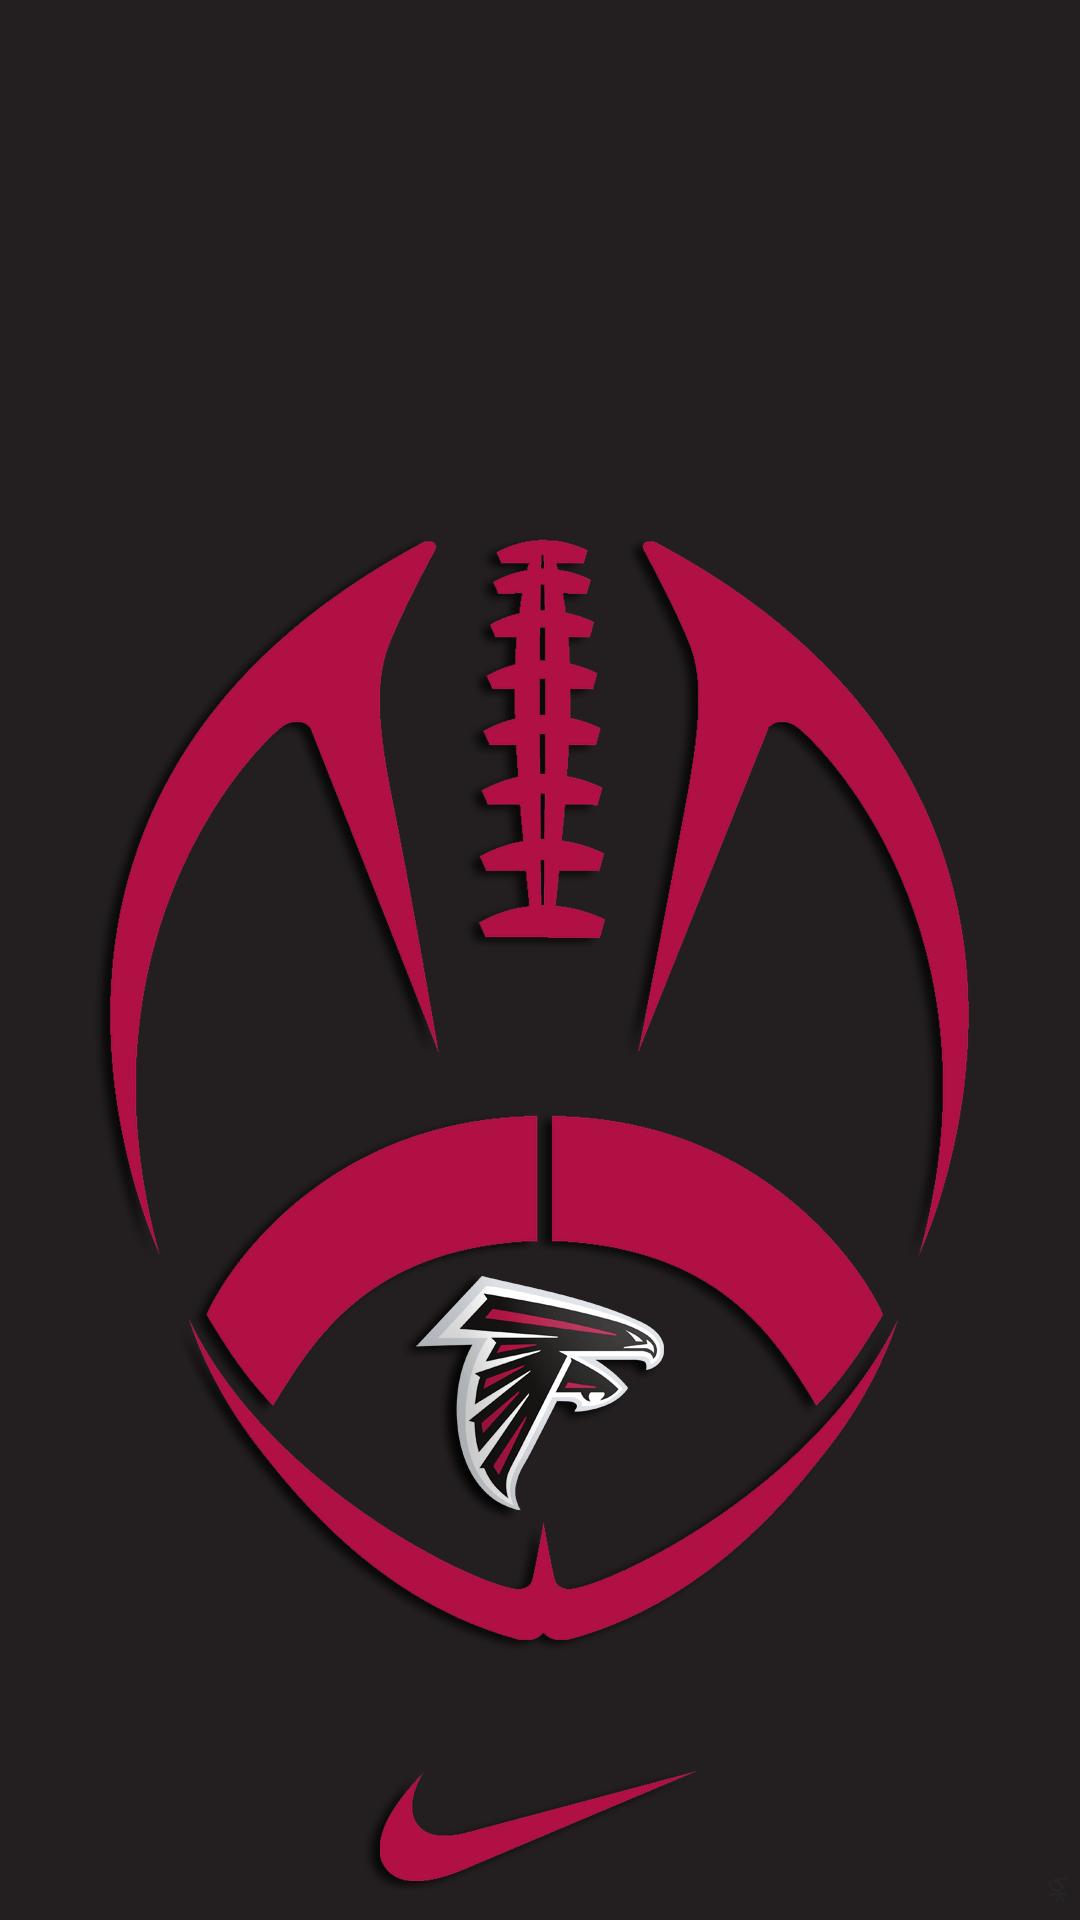 Atlanta Falcons Wallpapers - Top Free Atlanta Falcons ...